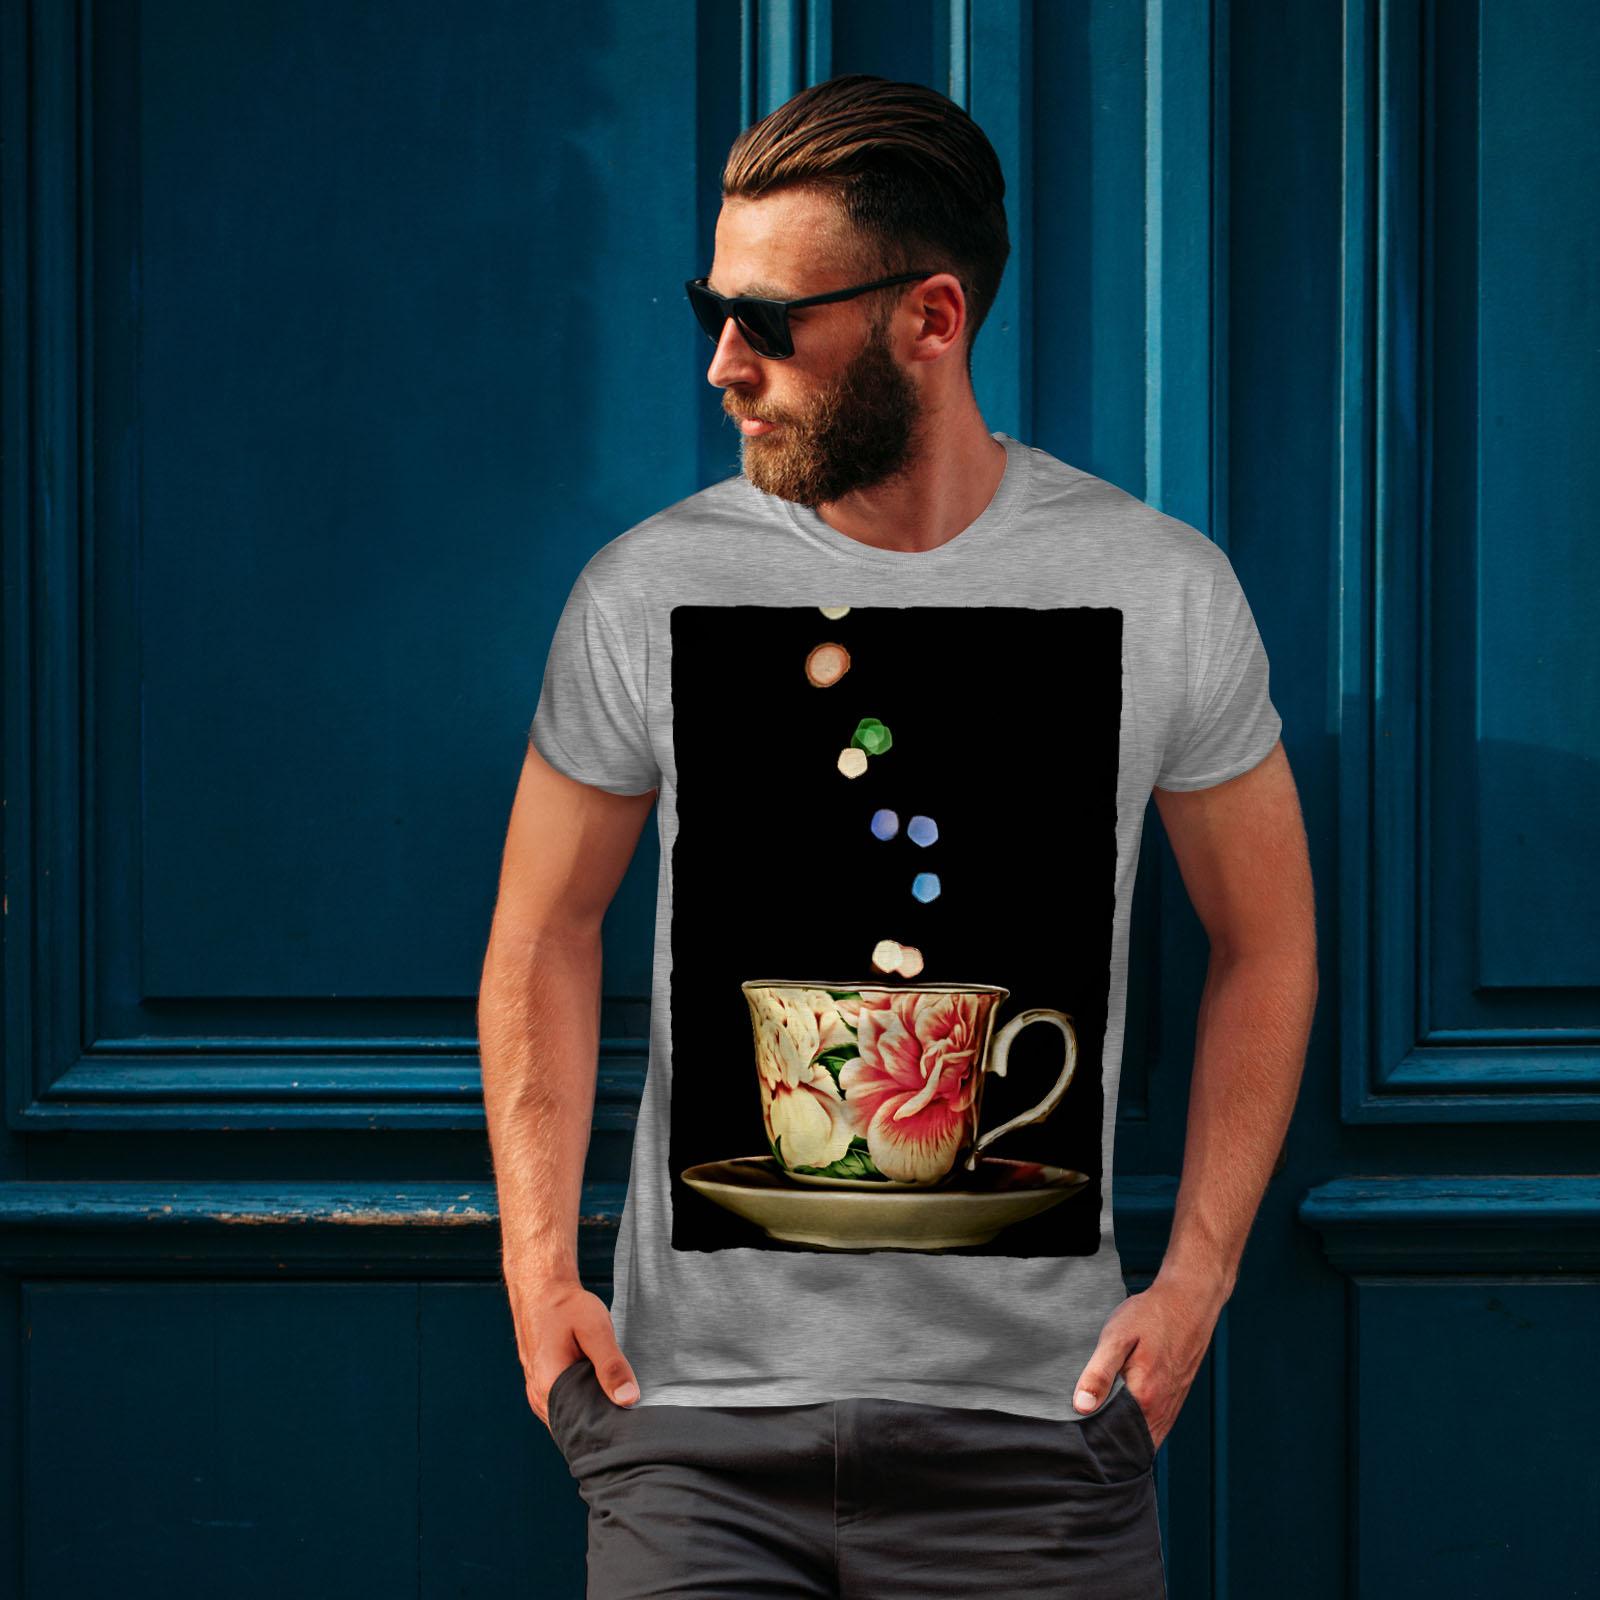 Wellcoda-Tea-Cup-Retro-Old-Mens-T-shirt-Smell-Graphic-Design-Printed-Tee thumbnail 16